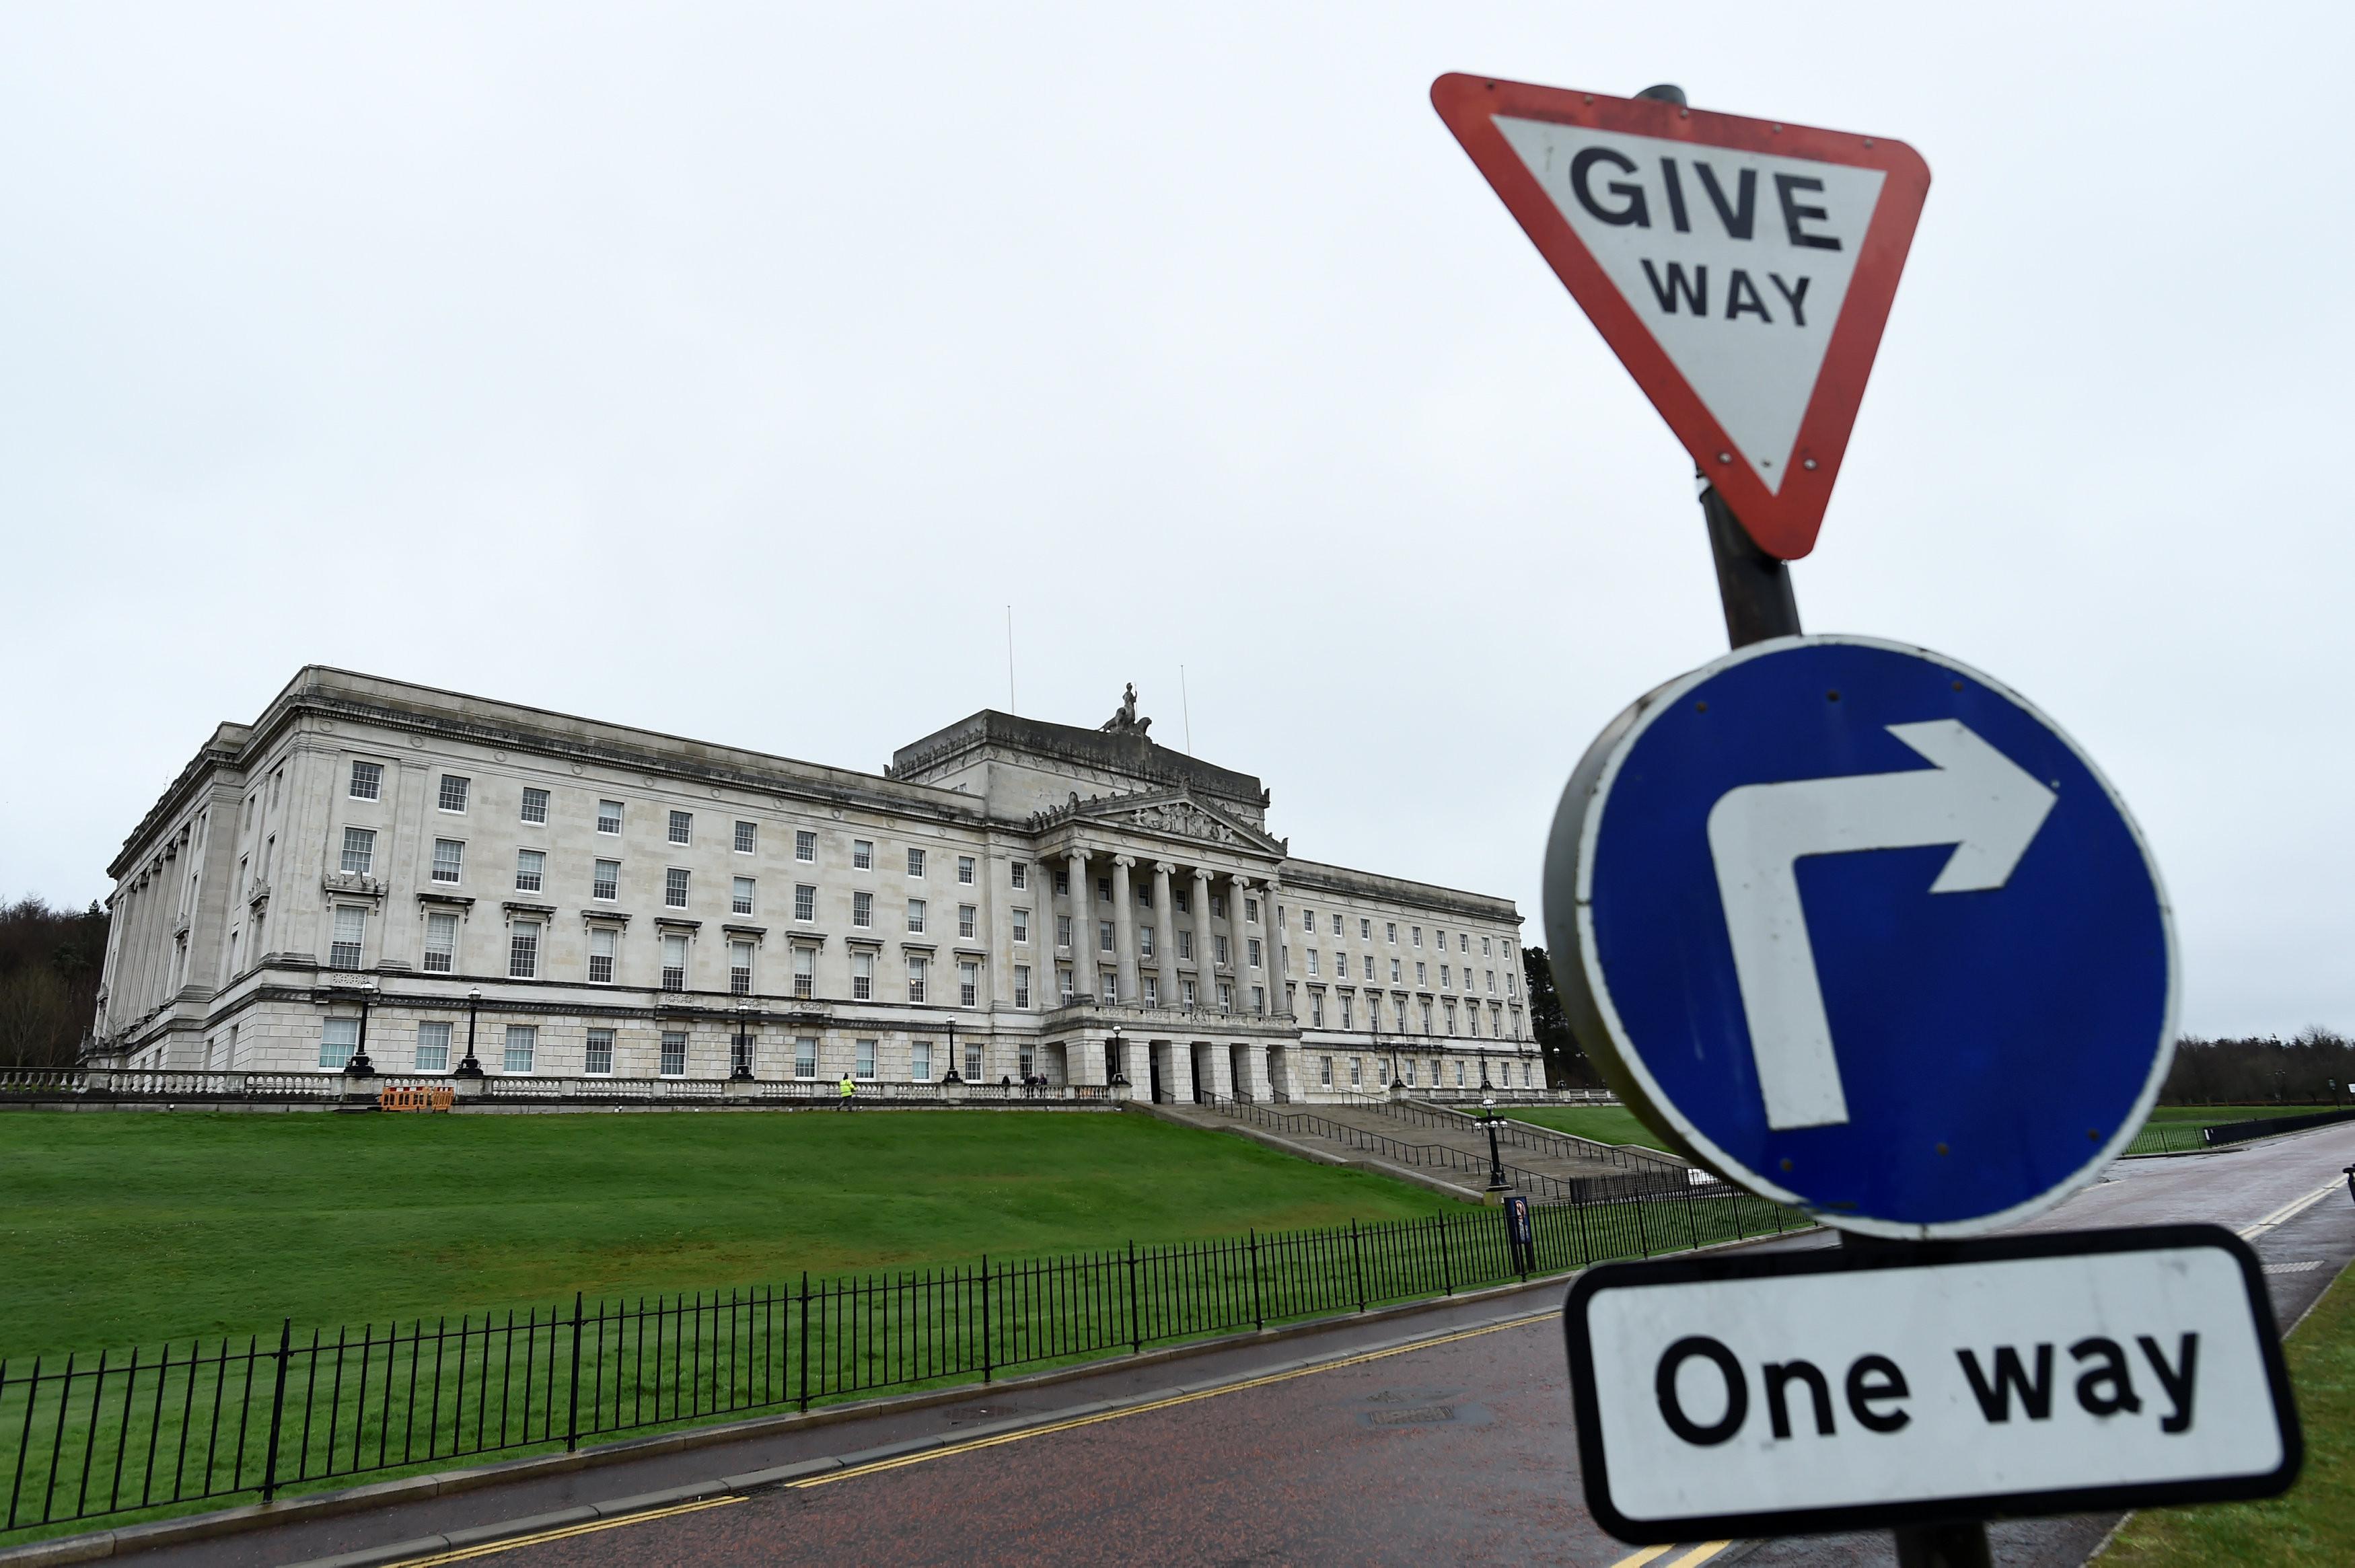 <p><span>Фото: &copy; REUTERS/Clodagh Kilcoyne</span></p>